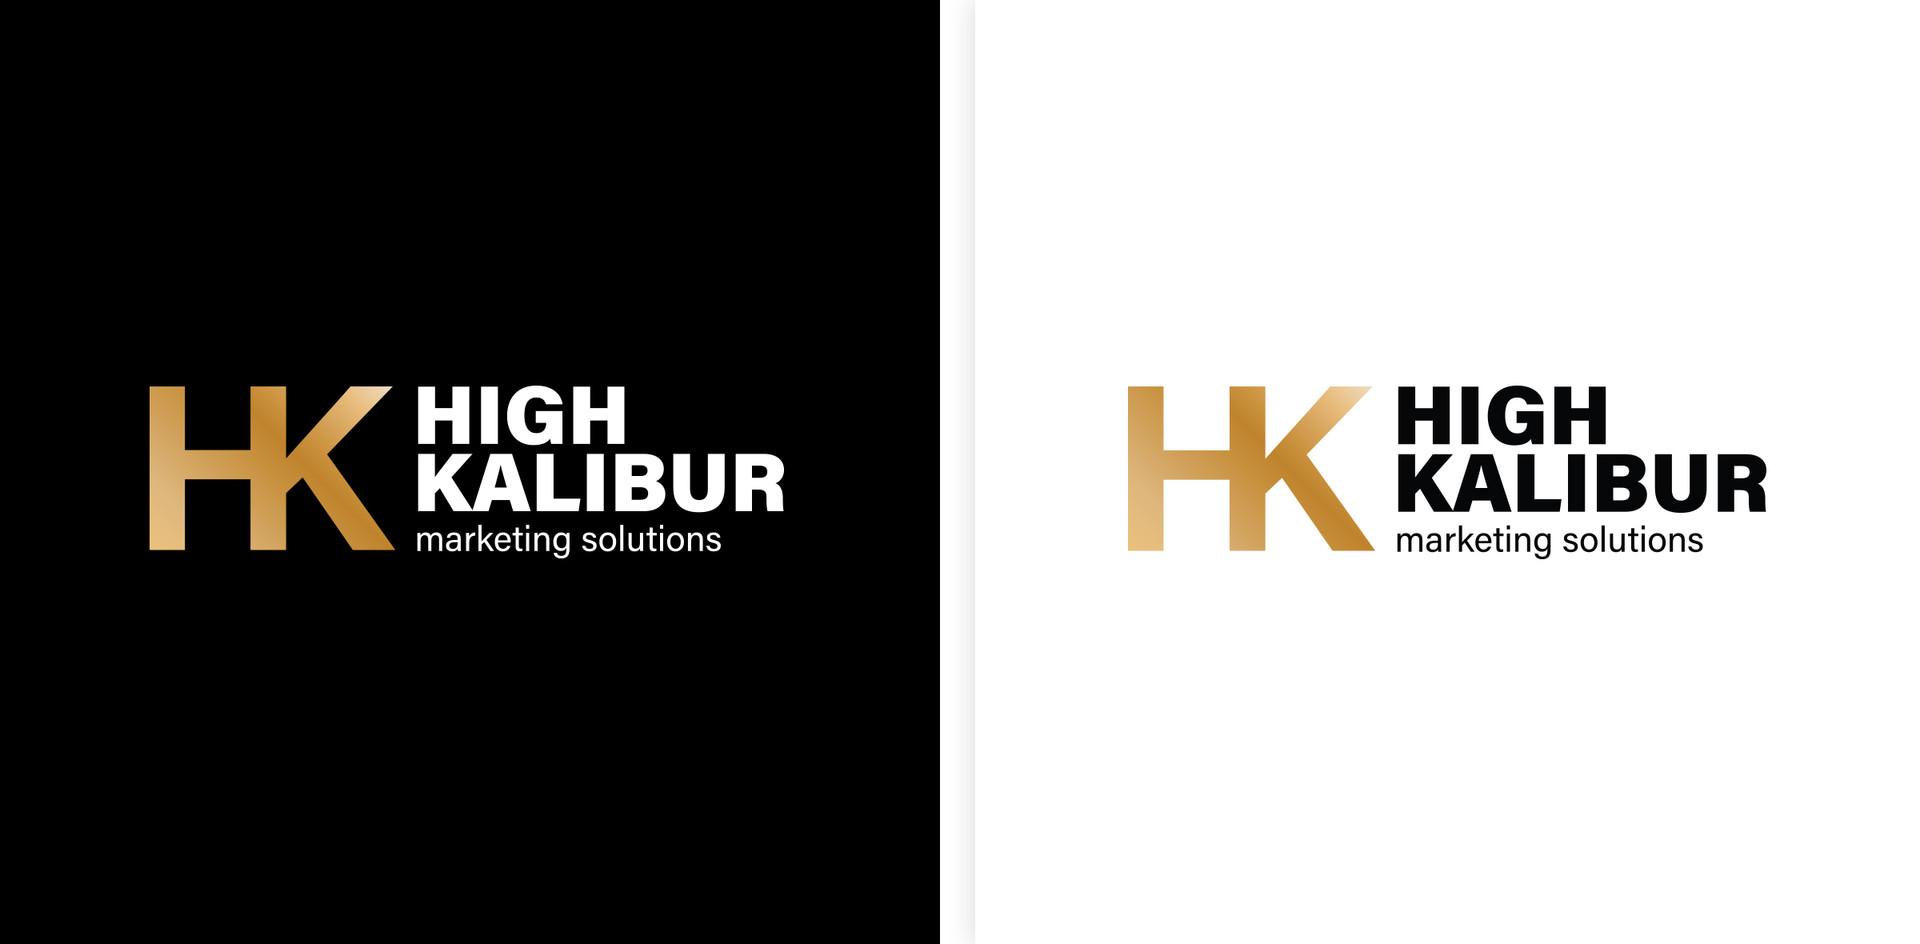 AreiaDesign-Portfolio-HighKalibur-3.jpg